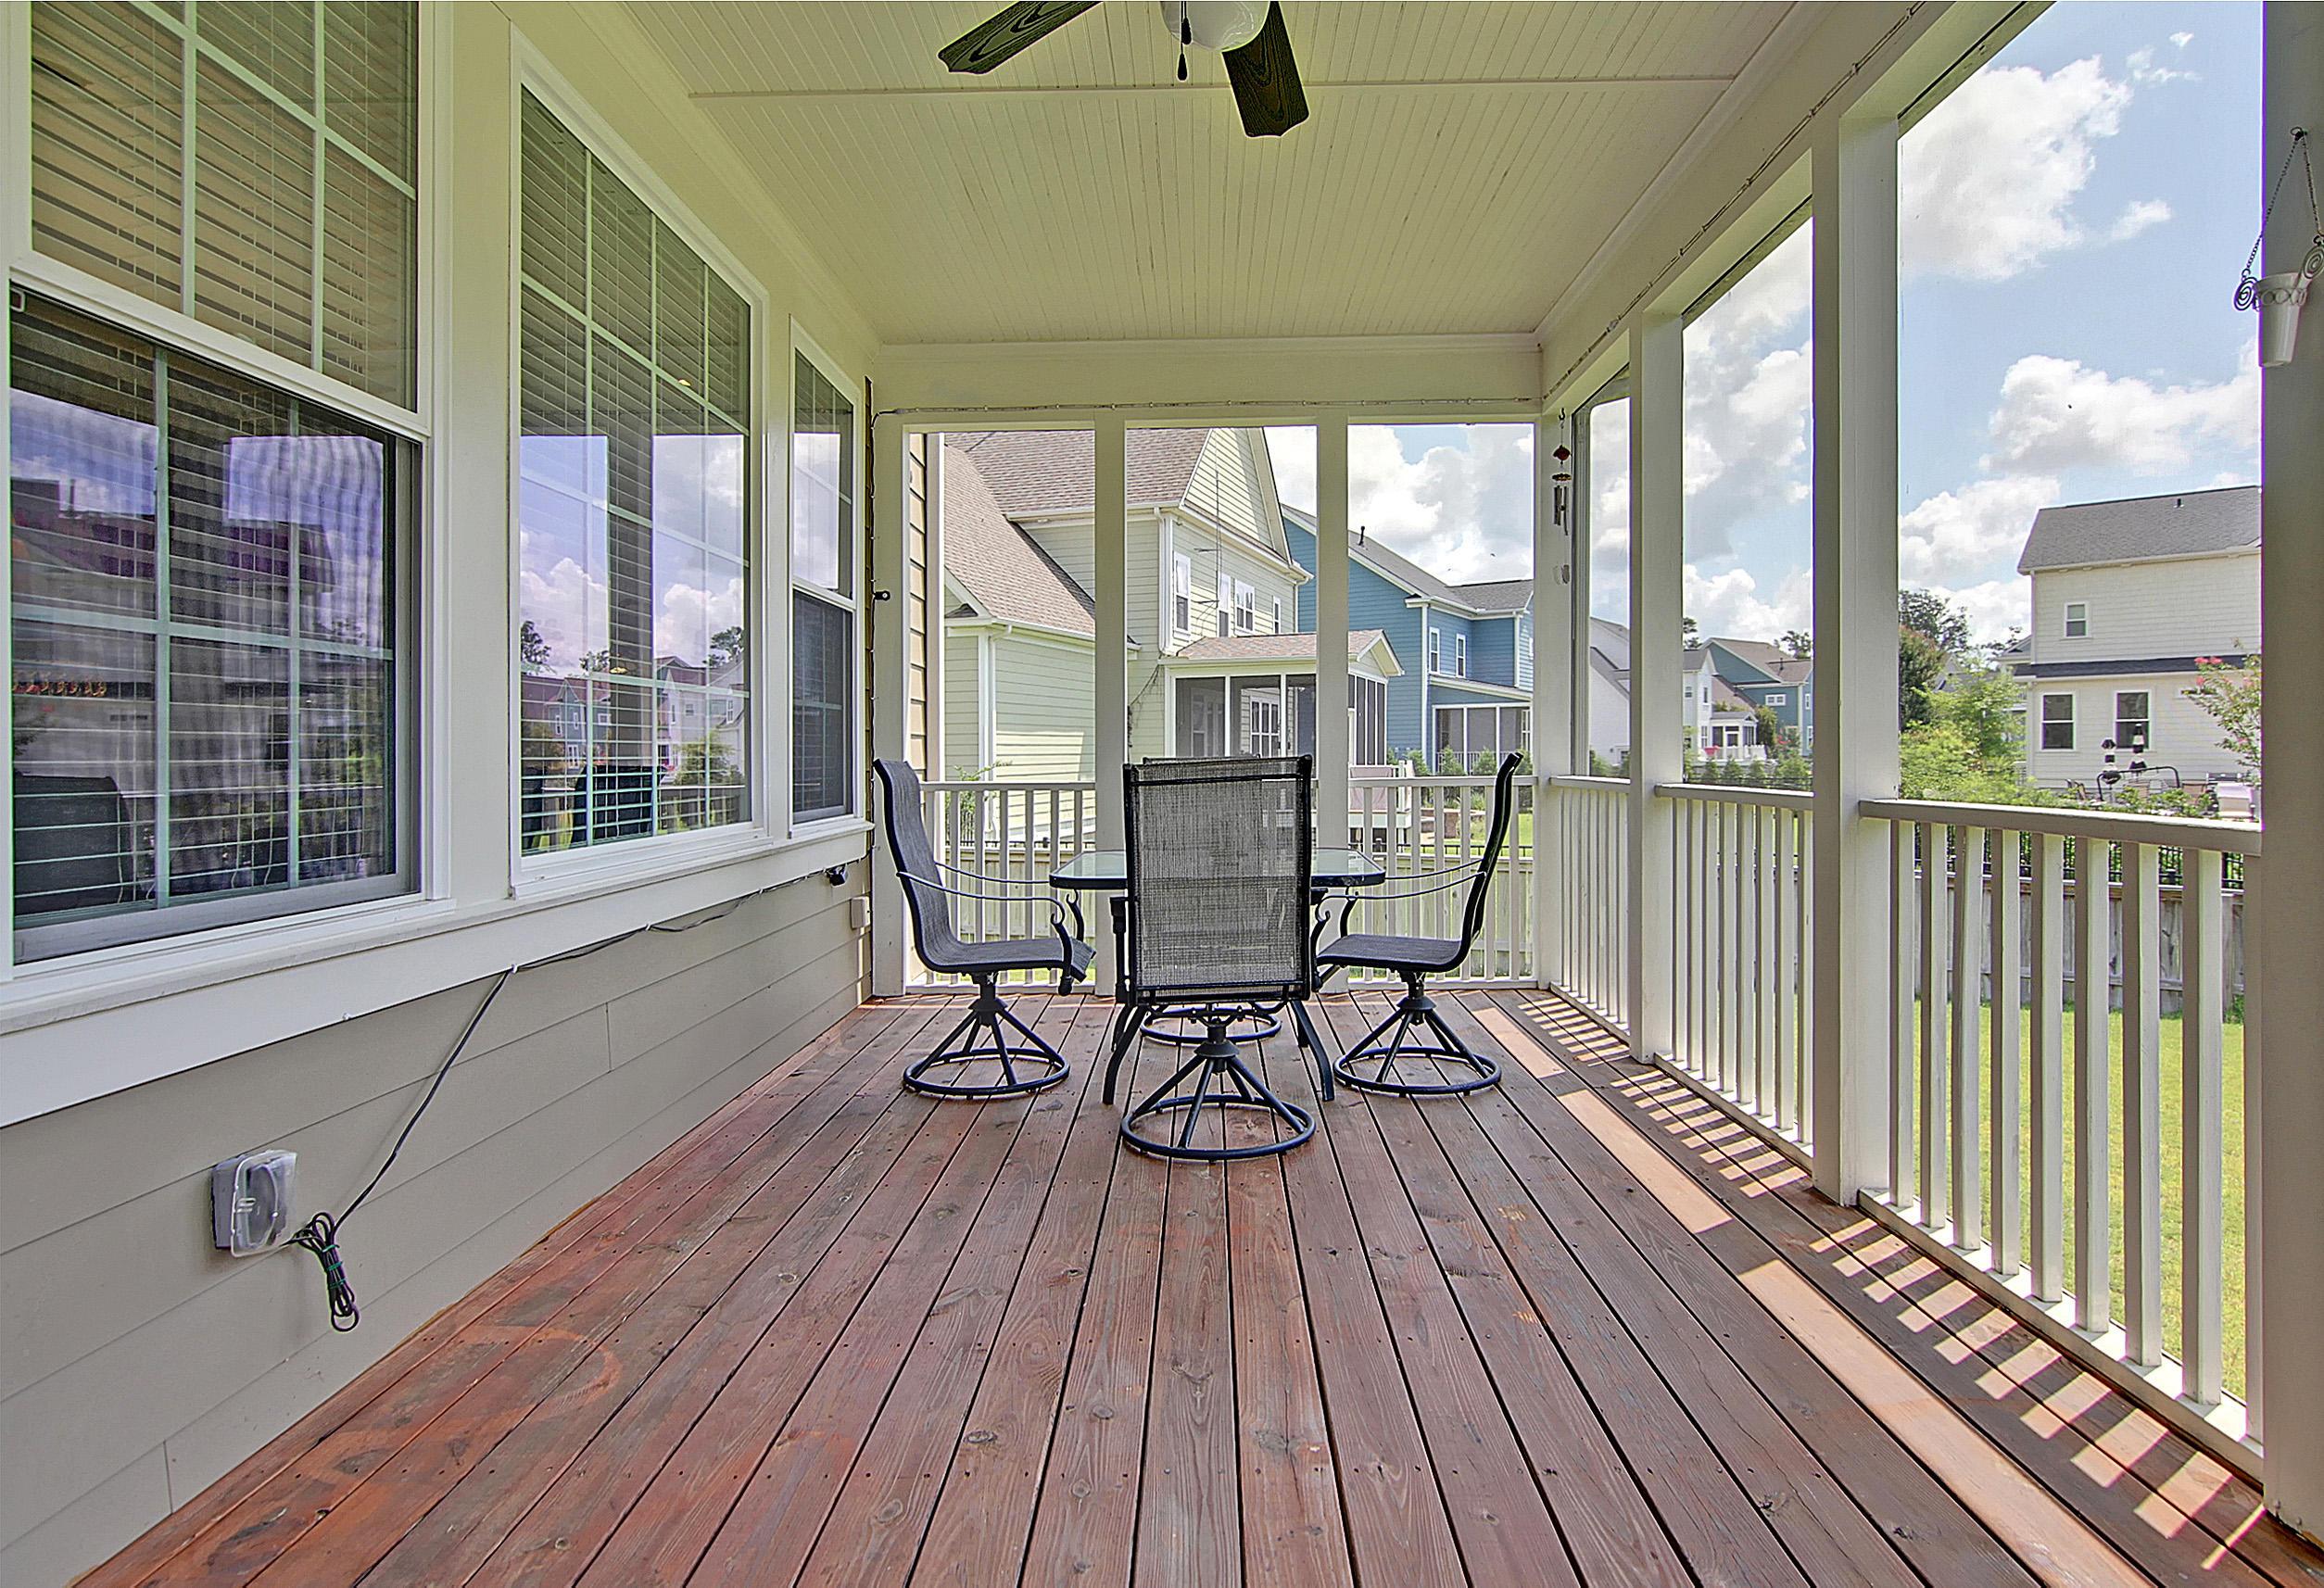 Dunes West Homes For Sale - 1332 Whisker Pole, Mount Pleasant, SC - 56